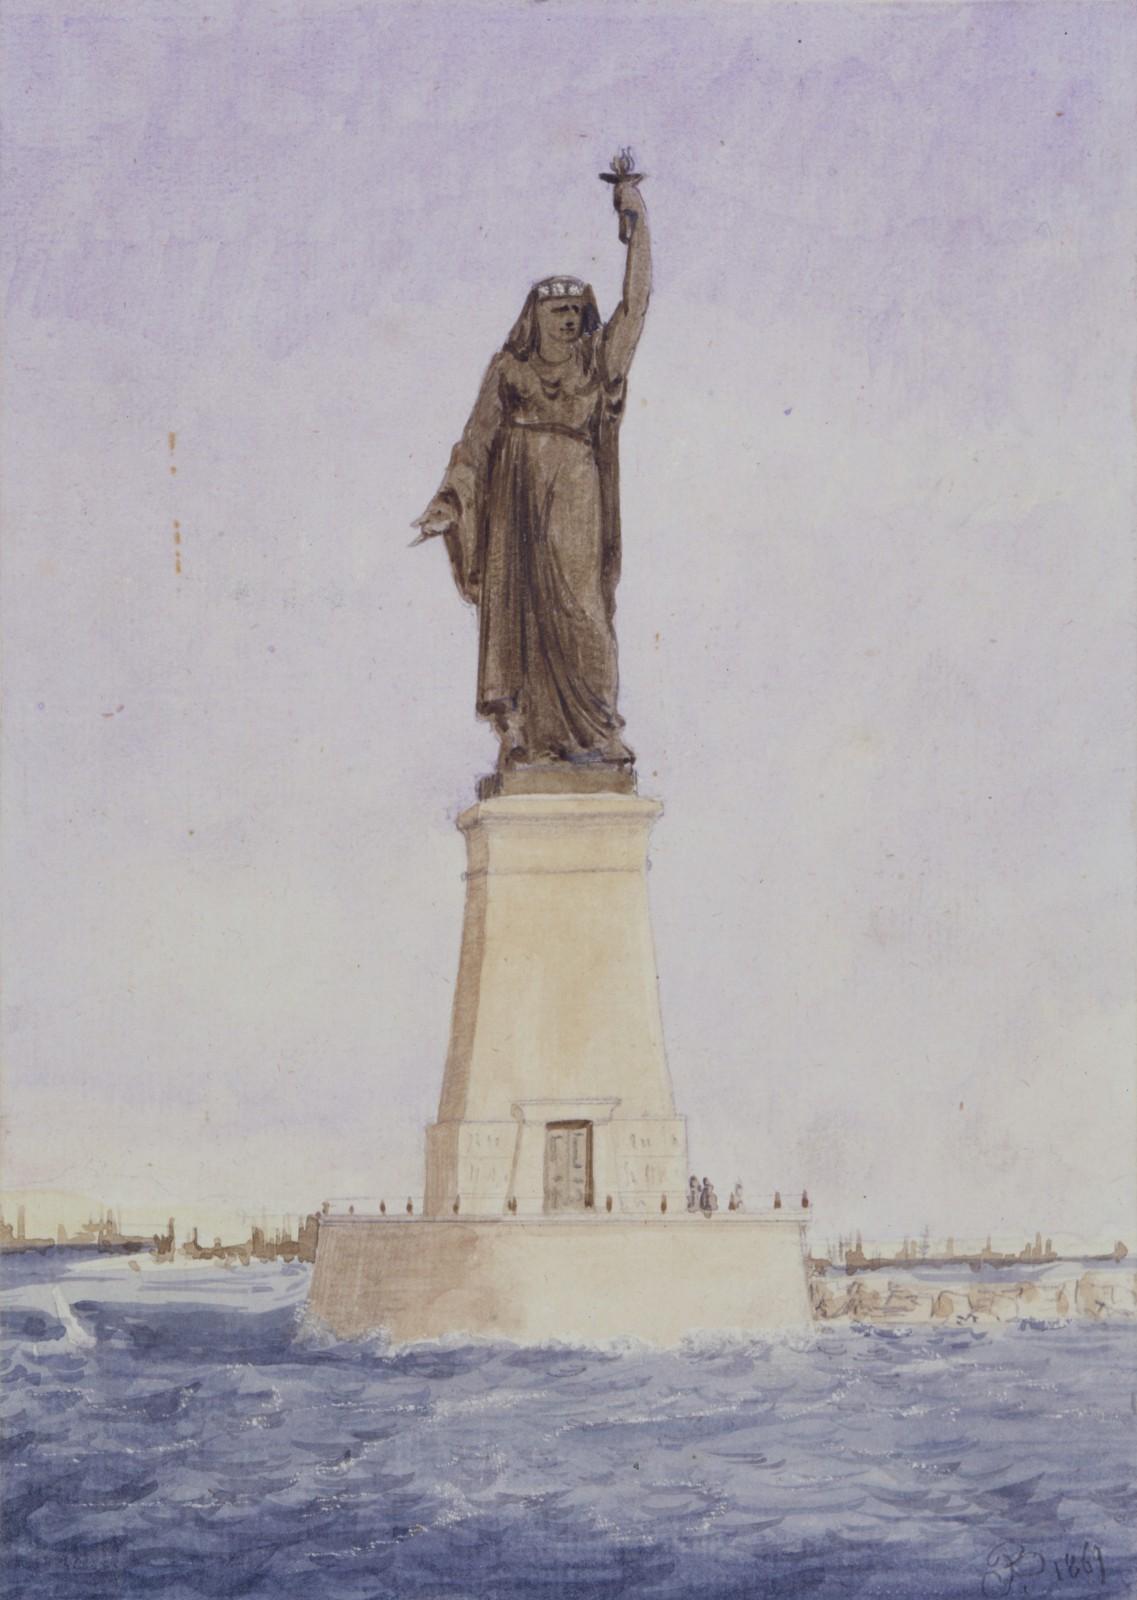 Lady Liberty Exhibitions Les Rencontres Darles